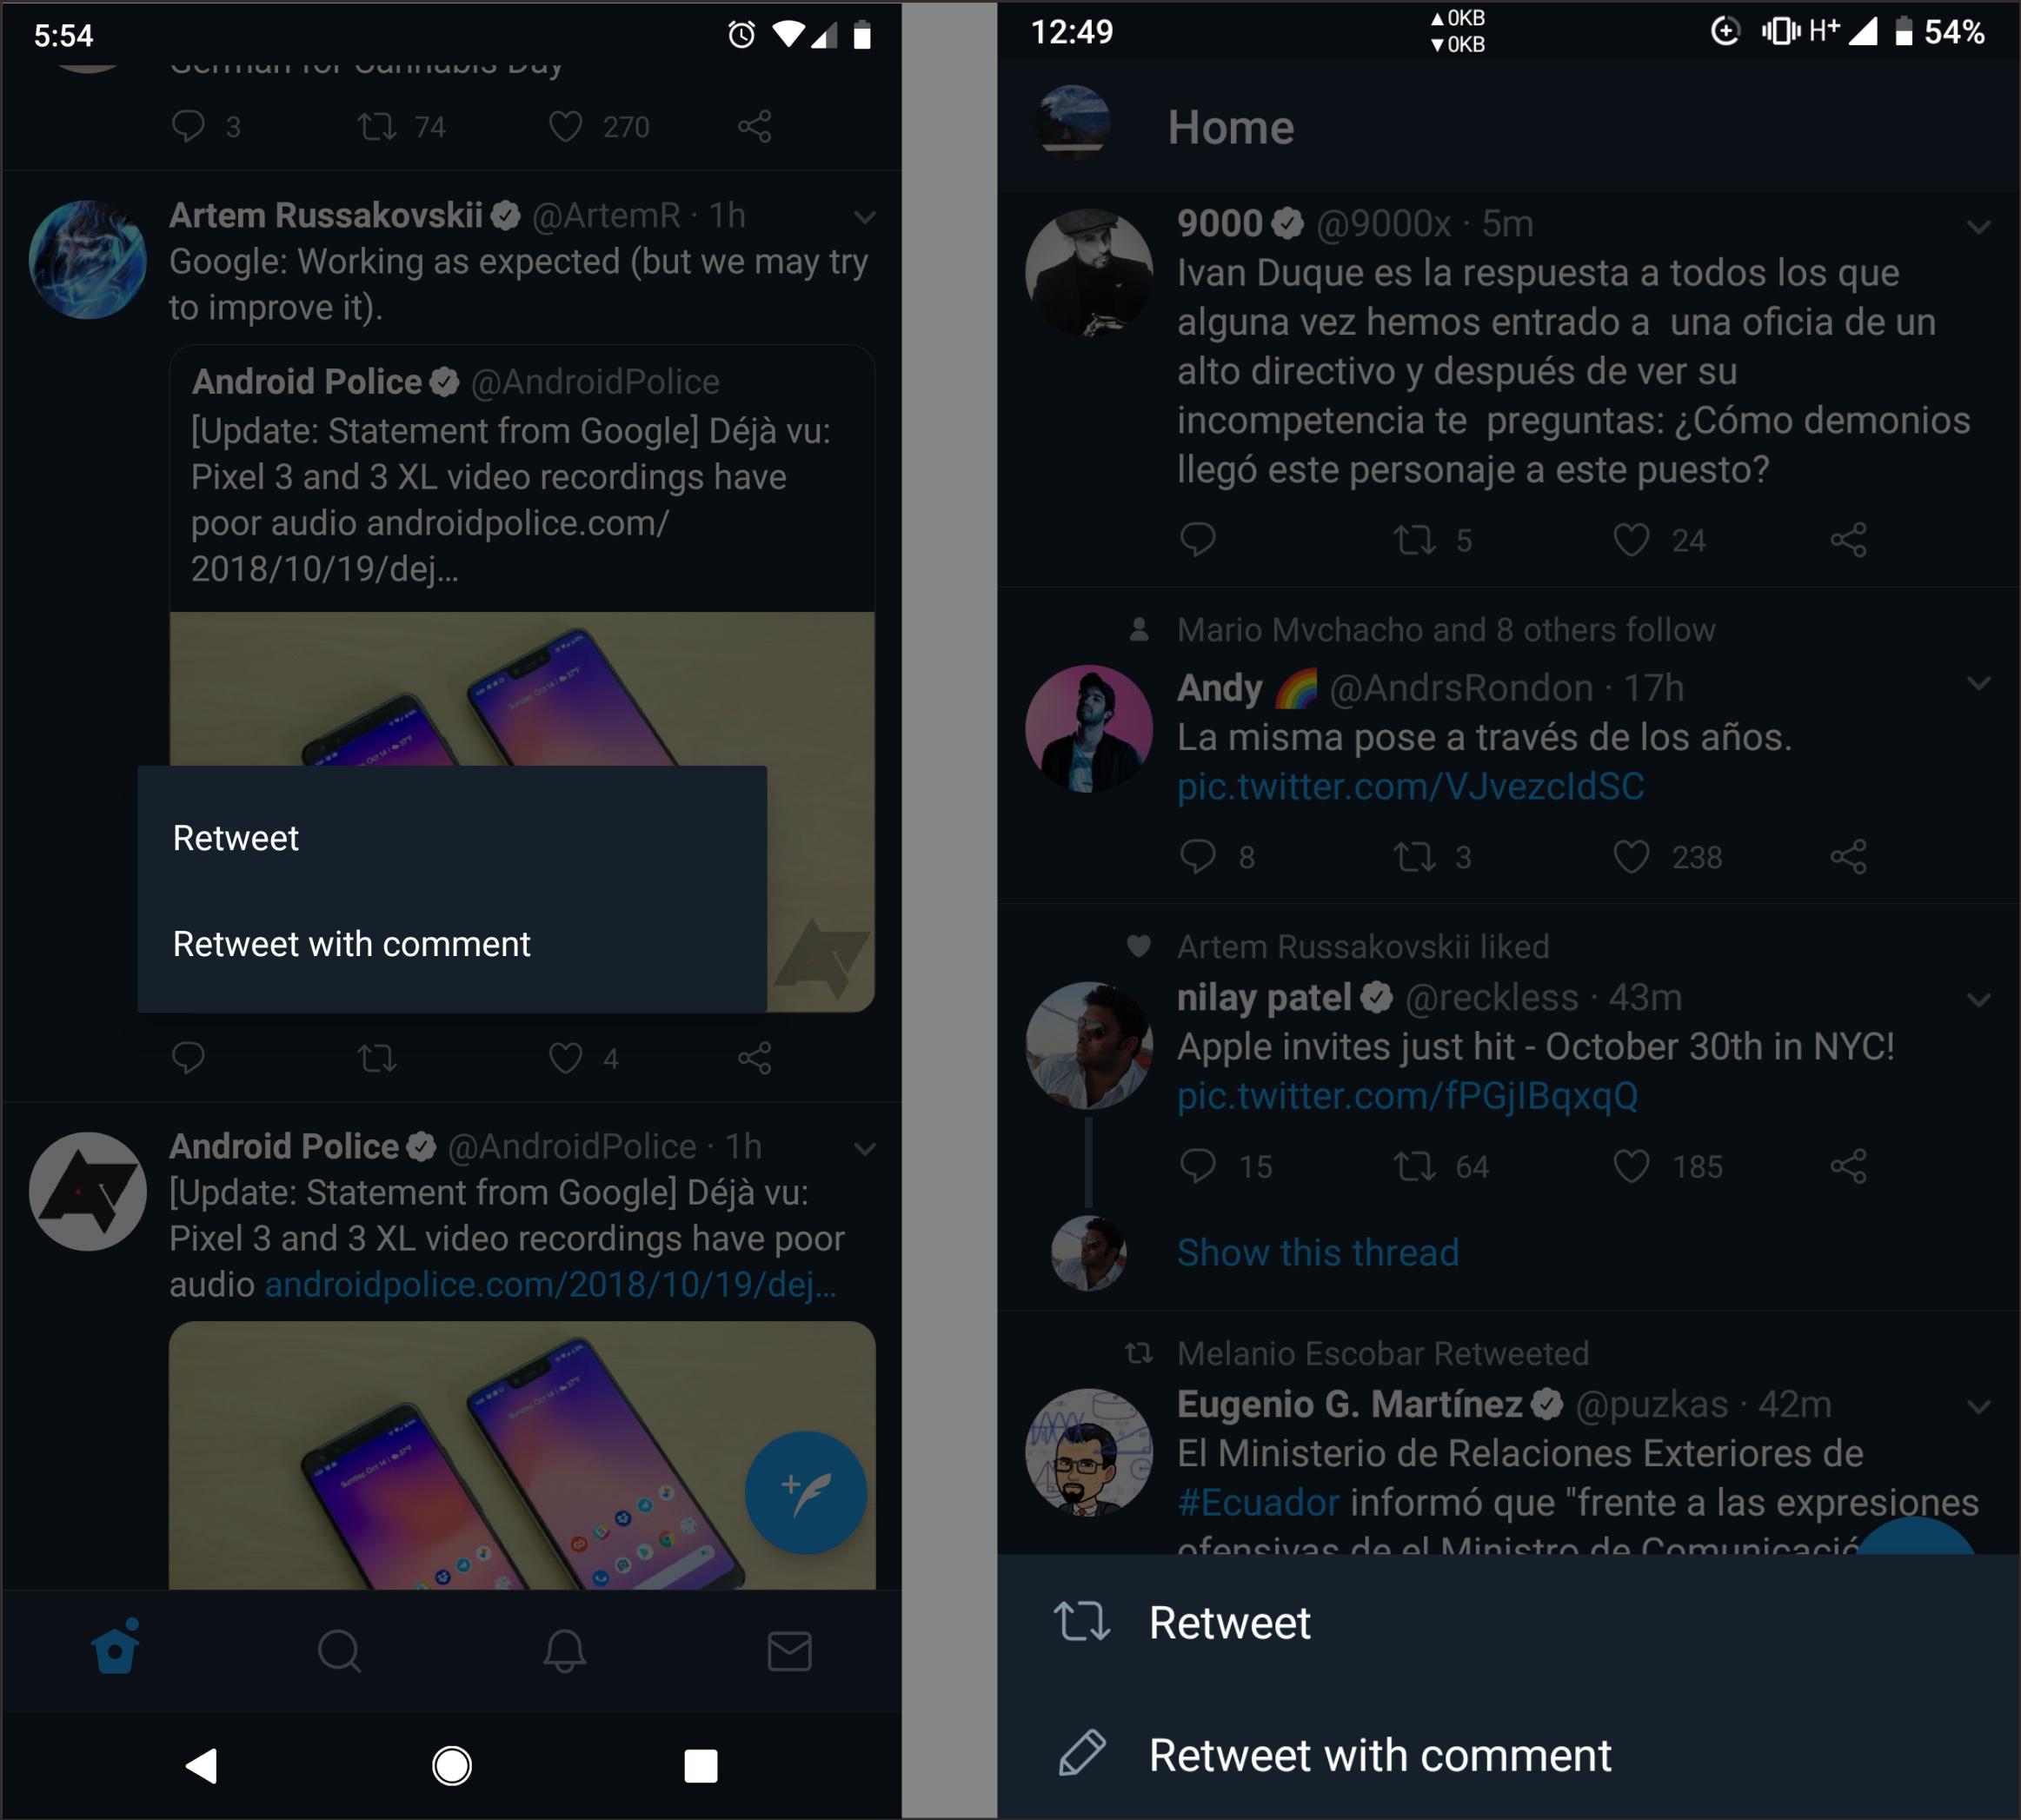 Twitter Lakukan Uji Perubahan UI Untuk Menu Retweet Untuk Lebih Dari Pada Tweet